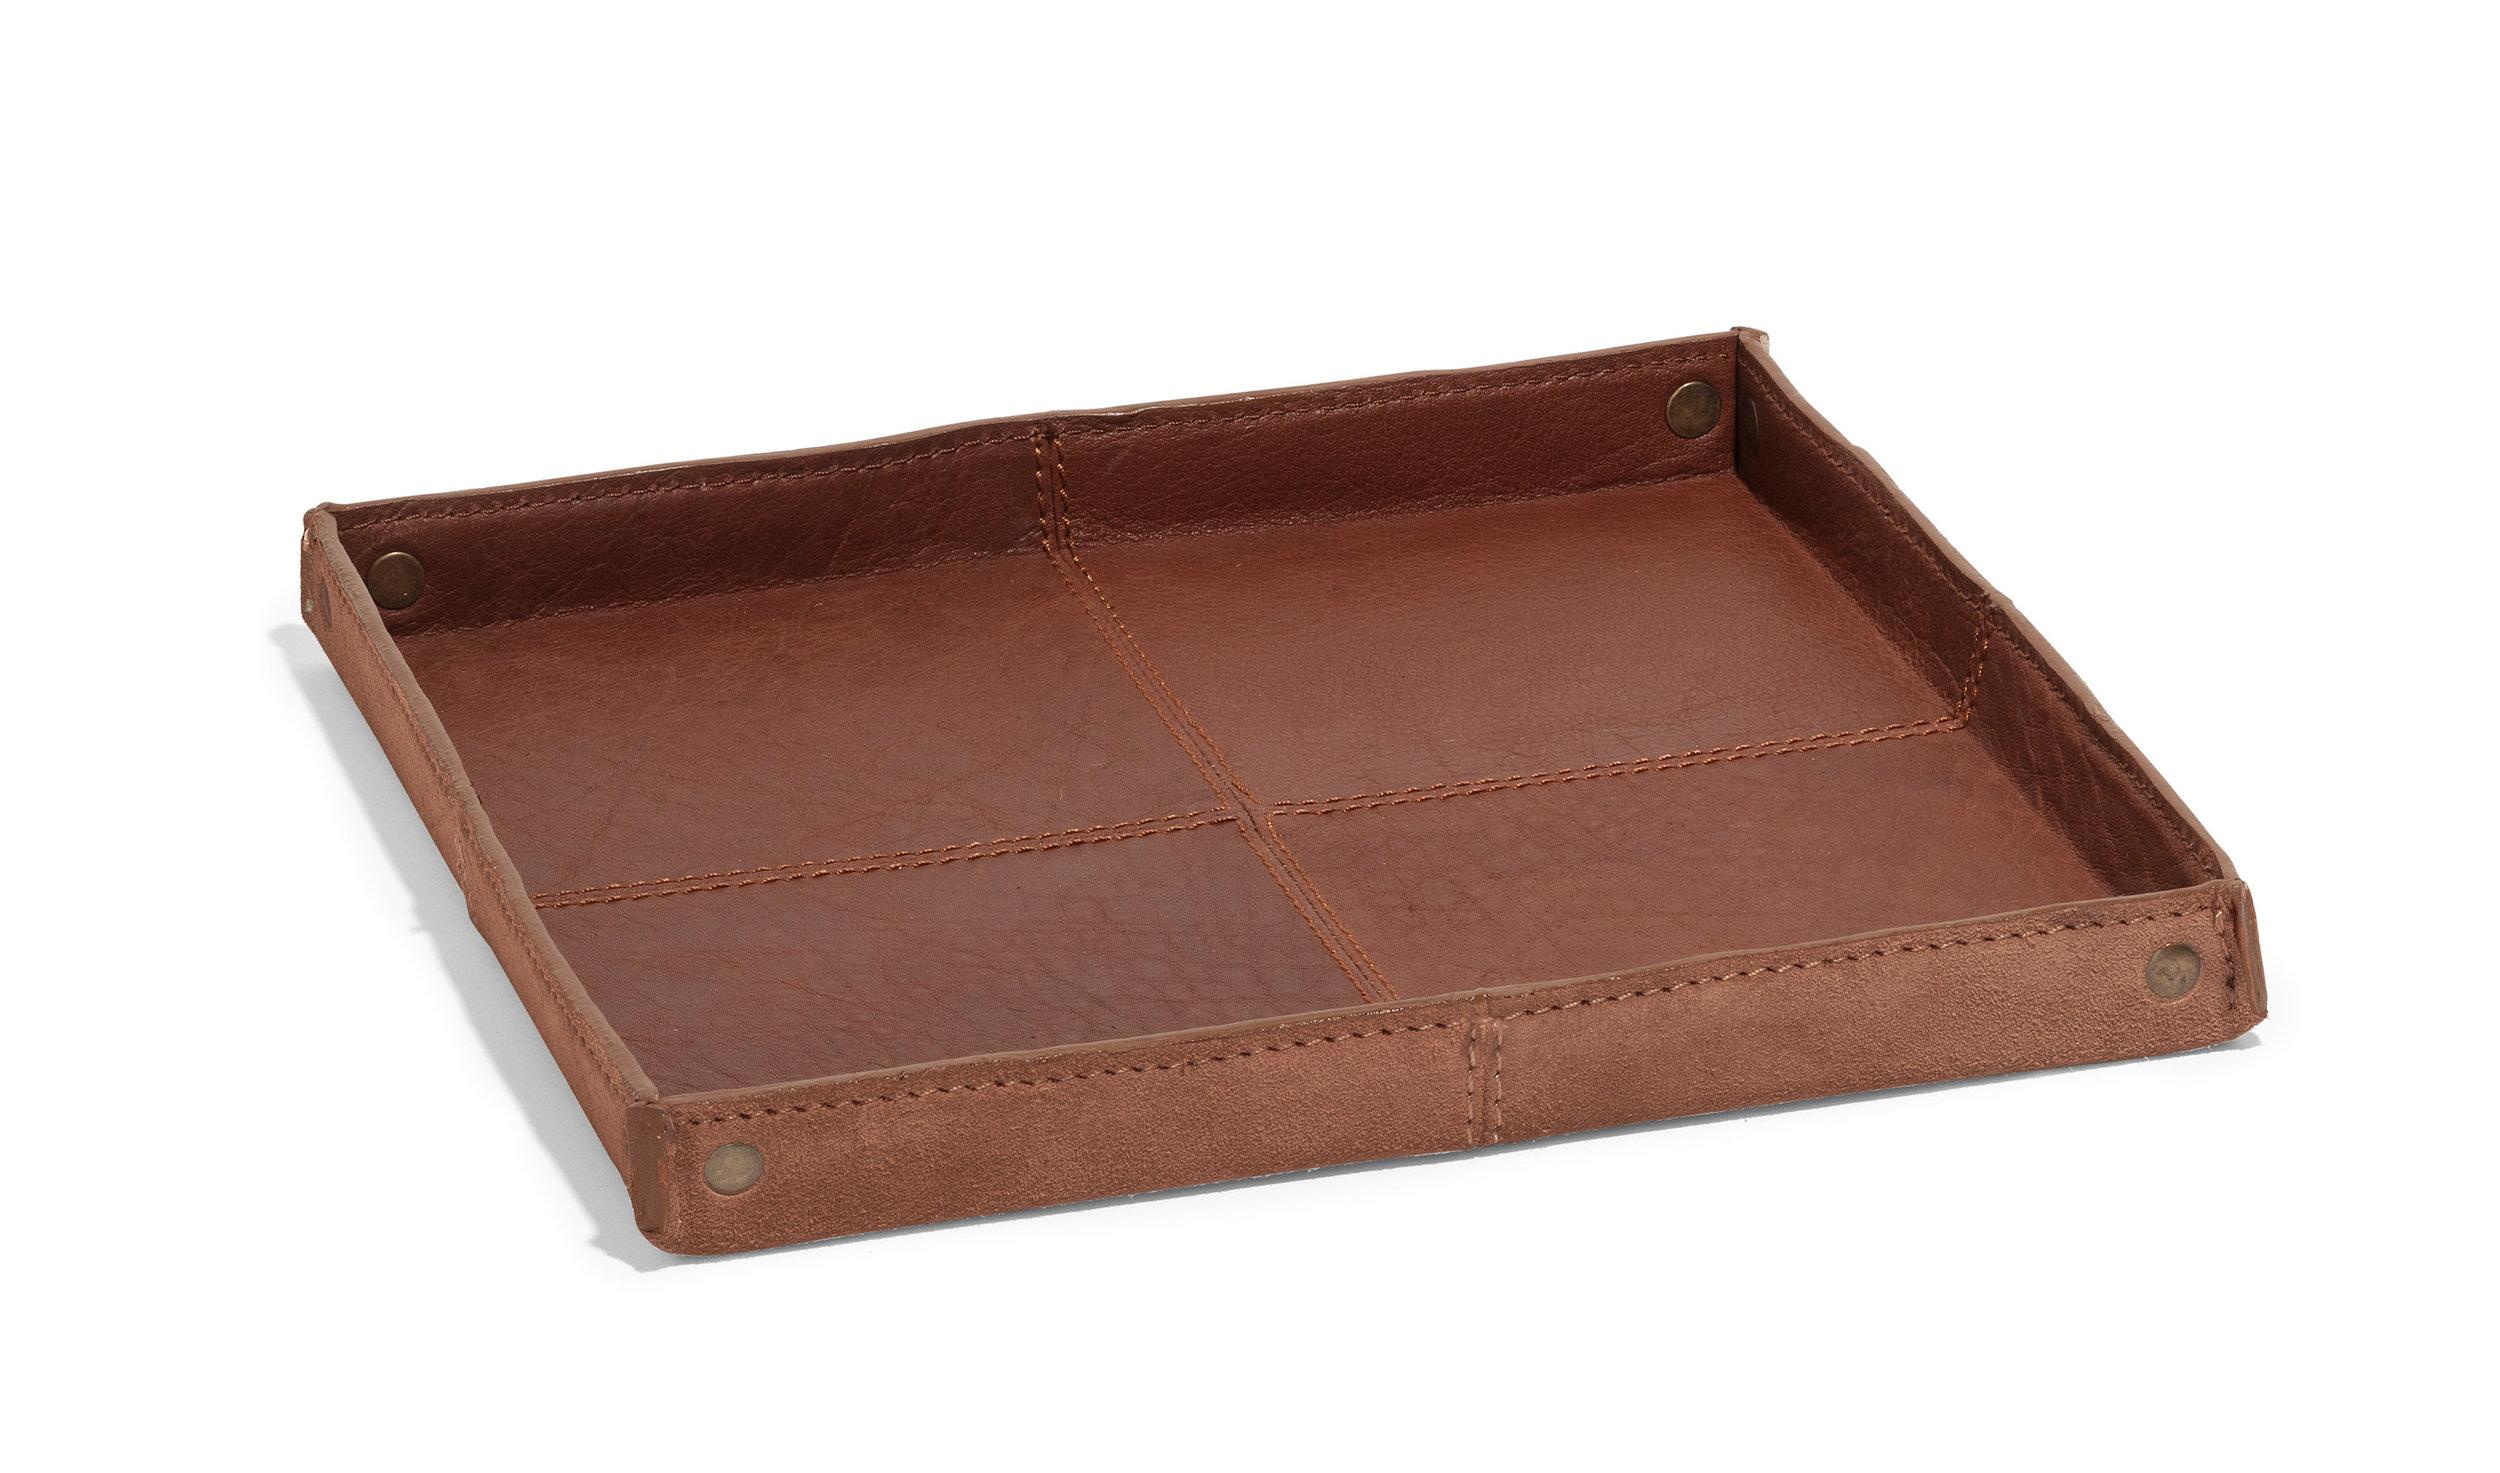 Harris tray cognac buffalo leather 24x24  Laig tray cognac buffalo leather 34x34